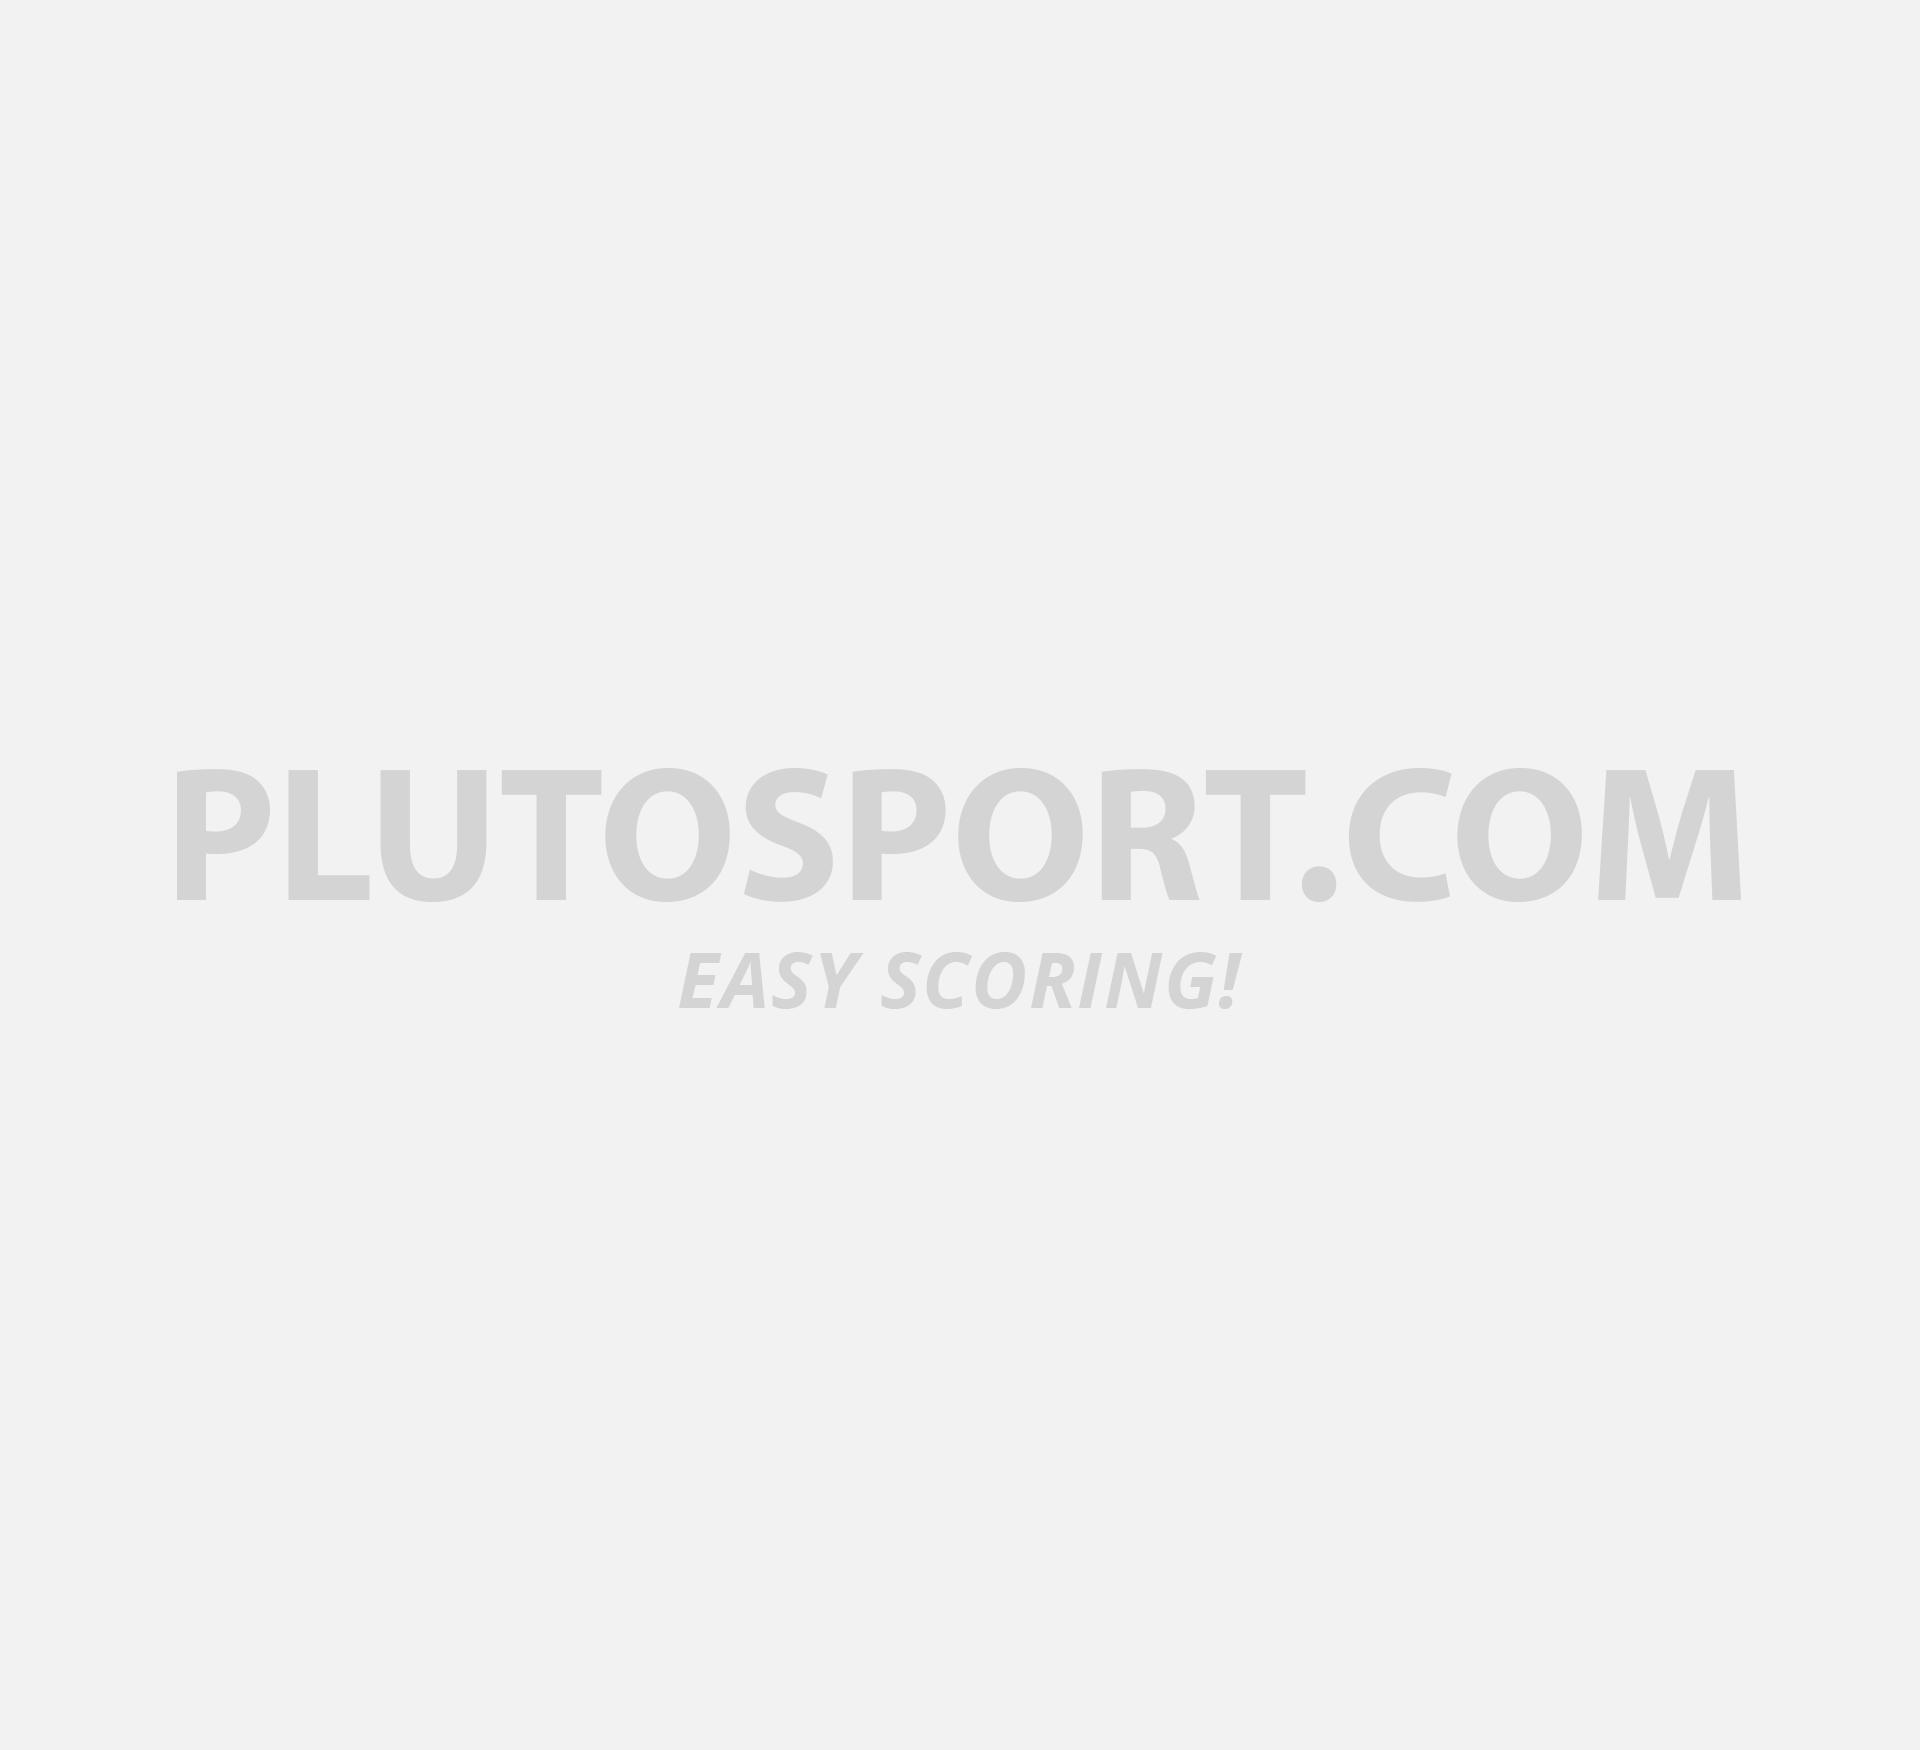 c20ba8f0414 Brabo Backpack Jr Love Love - Bags - Hockey - Sports | Plutosport